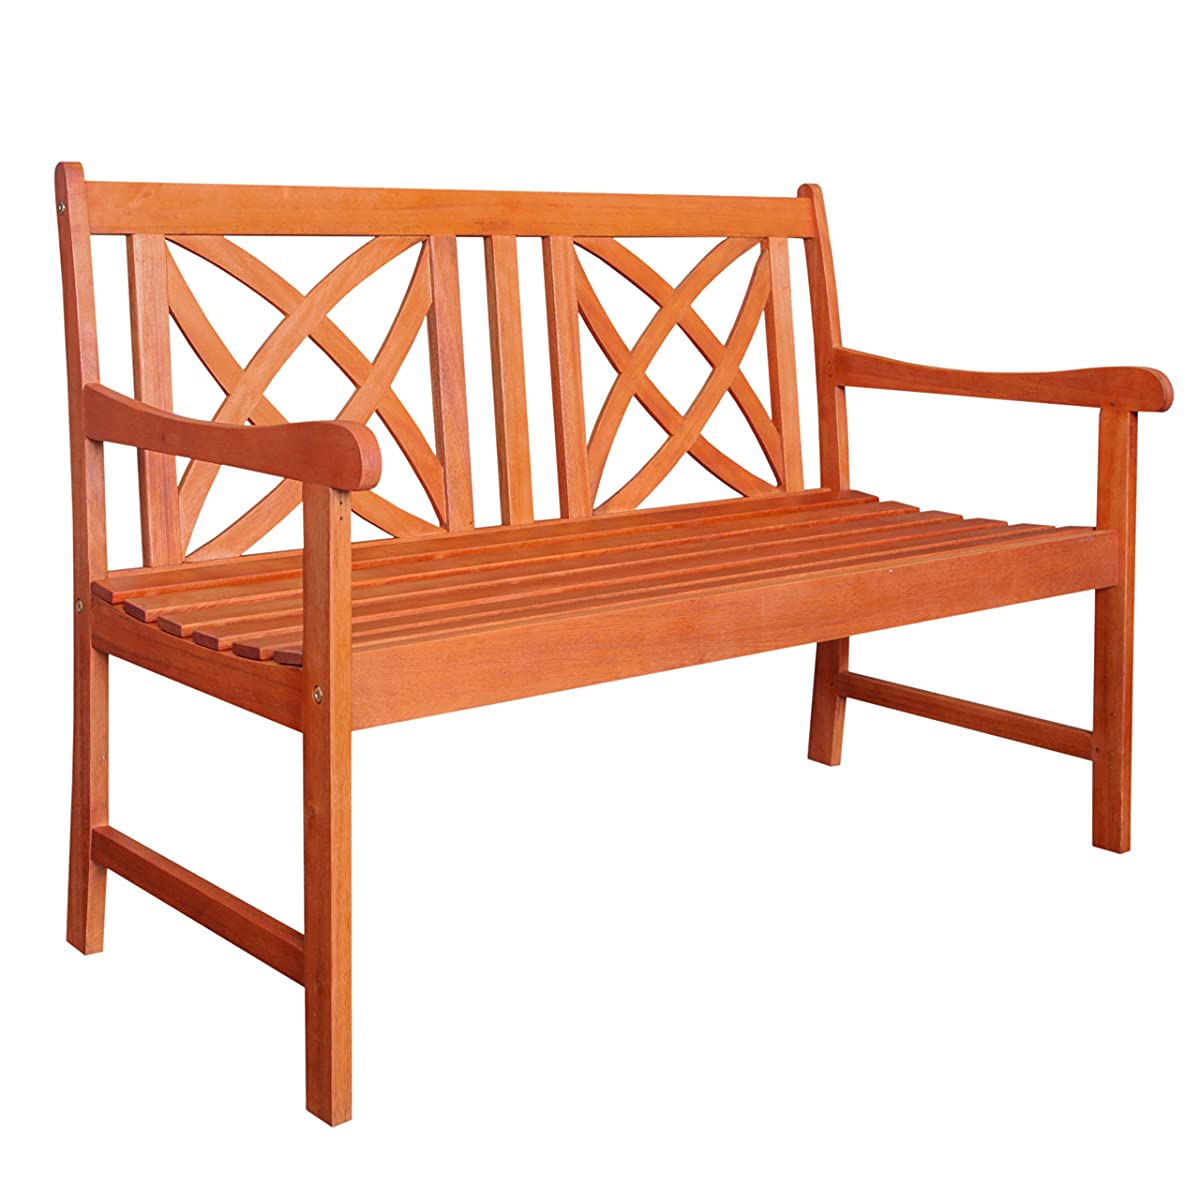 Vifah V1493 Outdoor Wood Garden Bench, 4-Feet